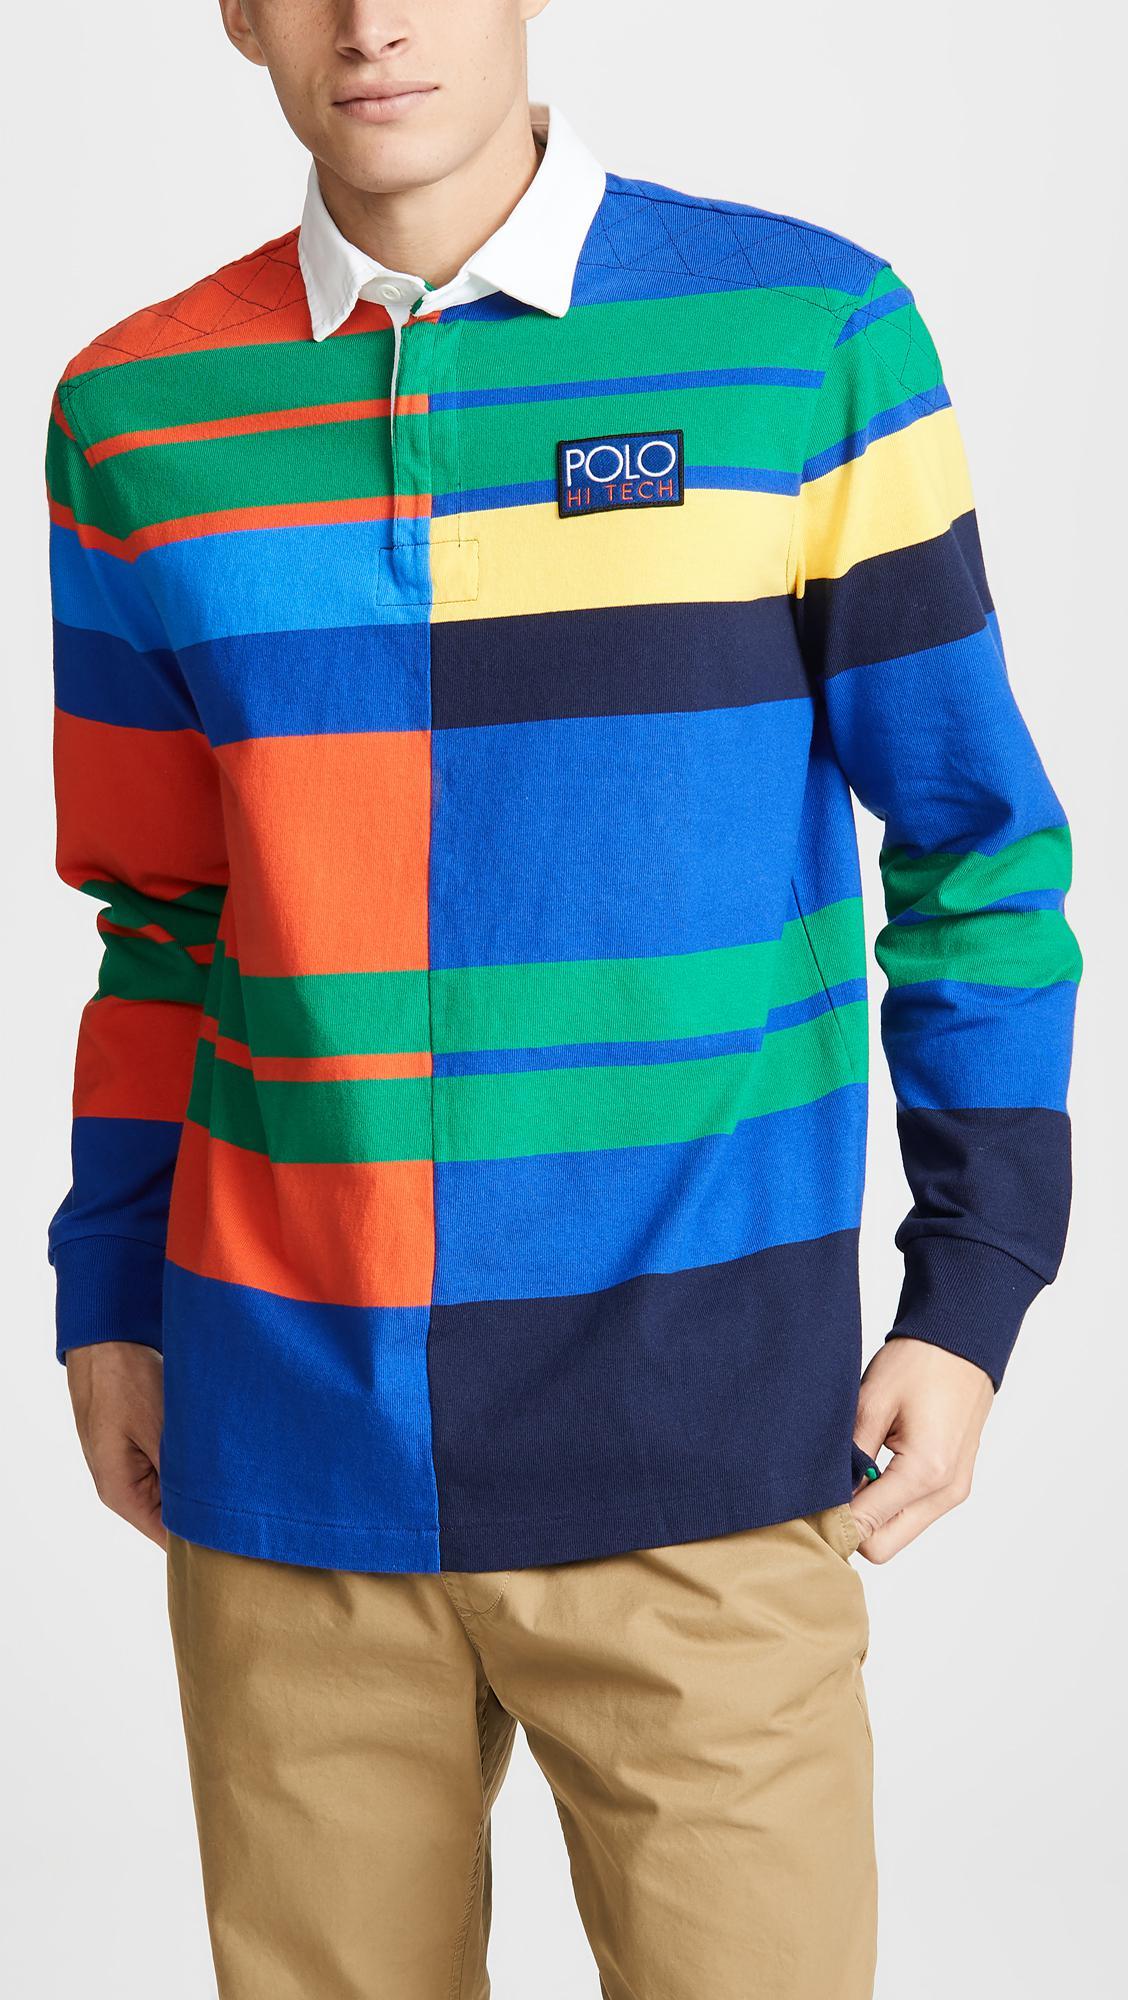 3a552e6cf68 ... ebay polo ralph lauren orange hi tech rustic rugby polo shirt for men  lyst. view